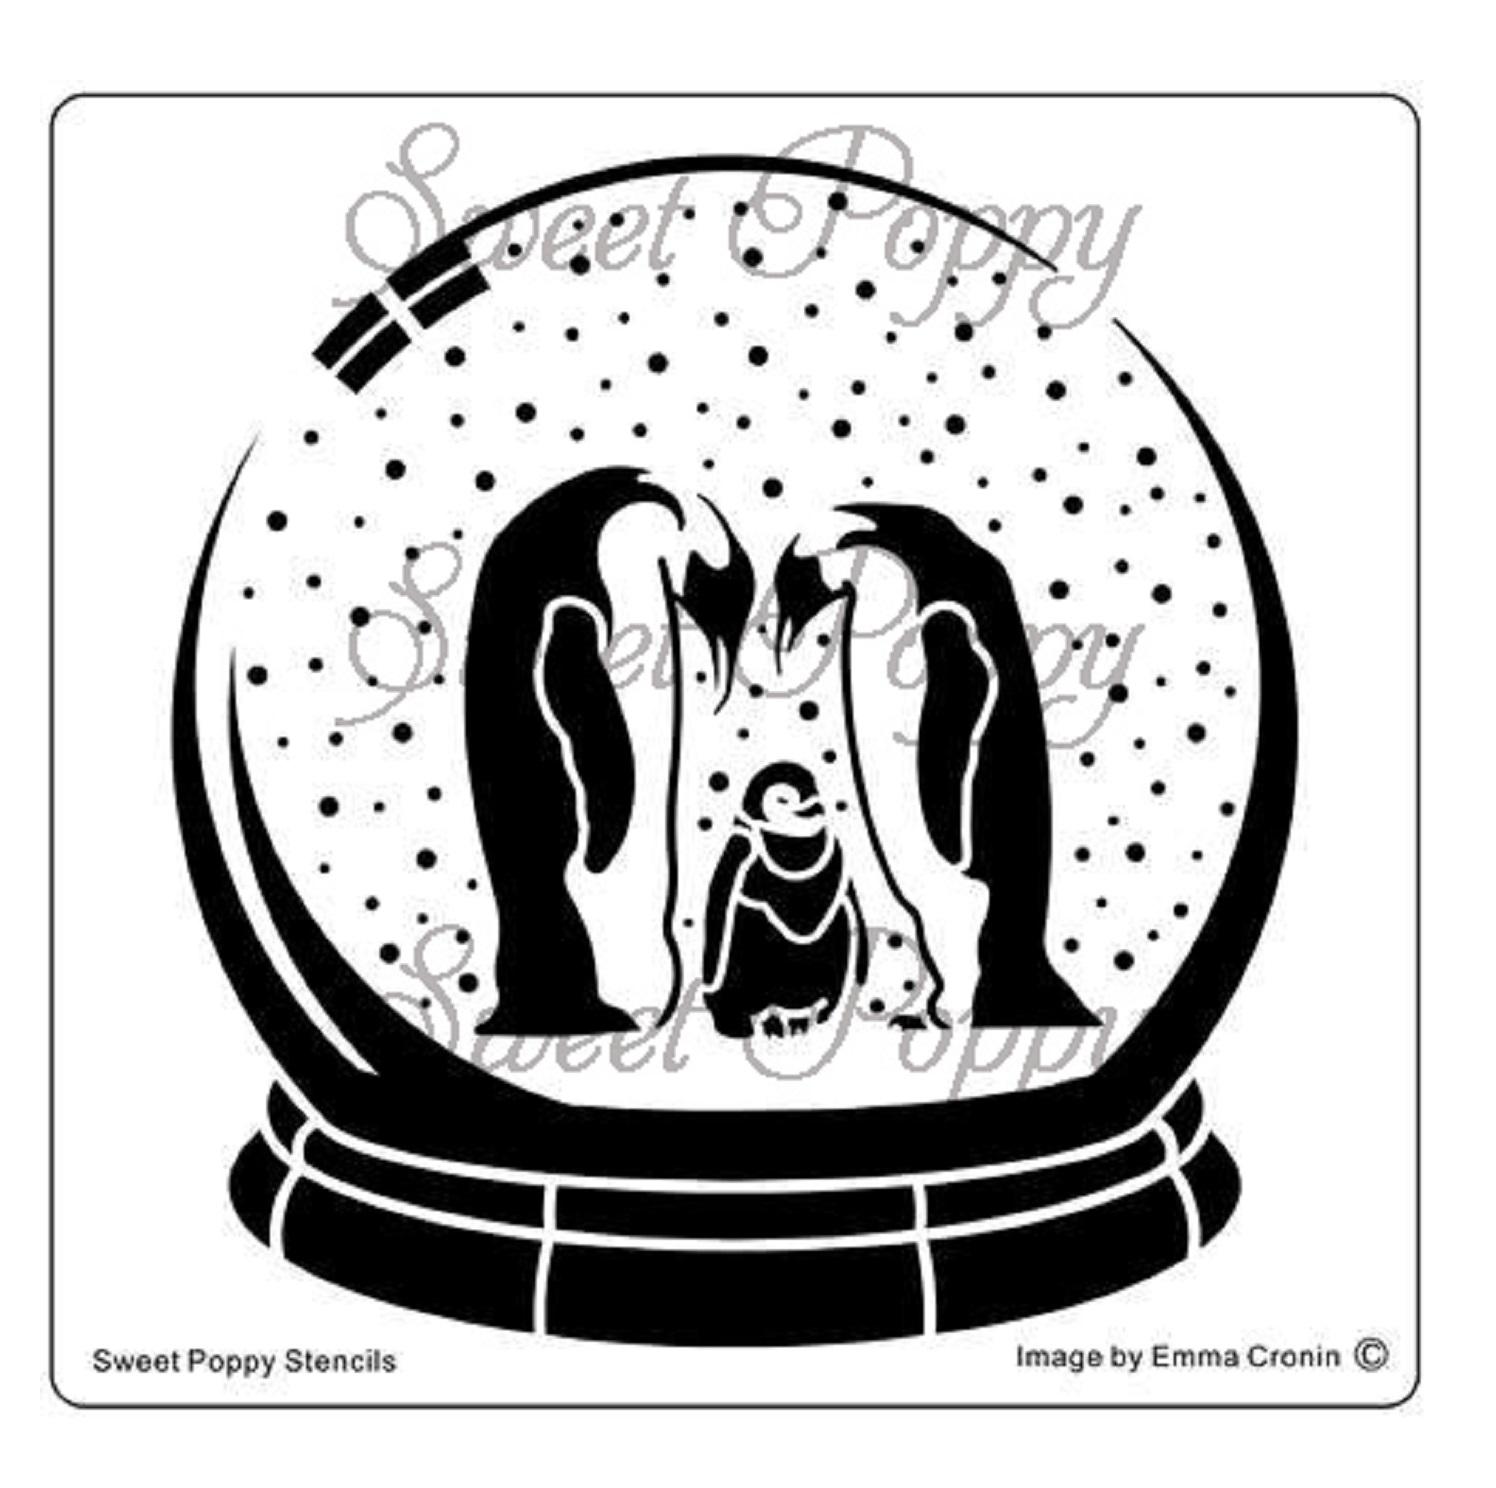 Sweet Poppy Stencil: Snow Globe – Penguin family